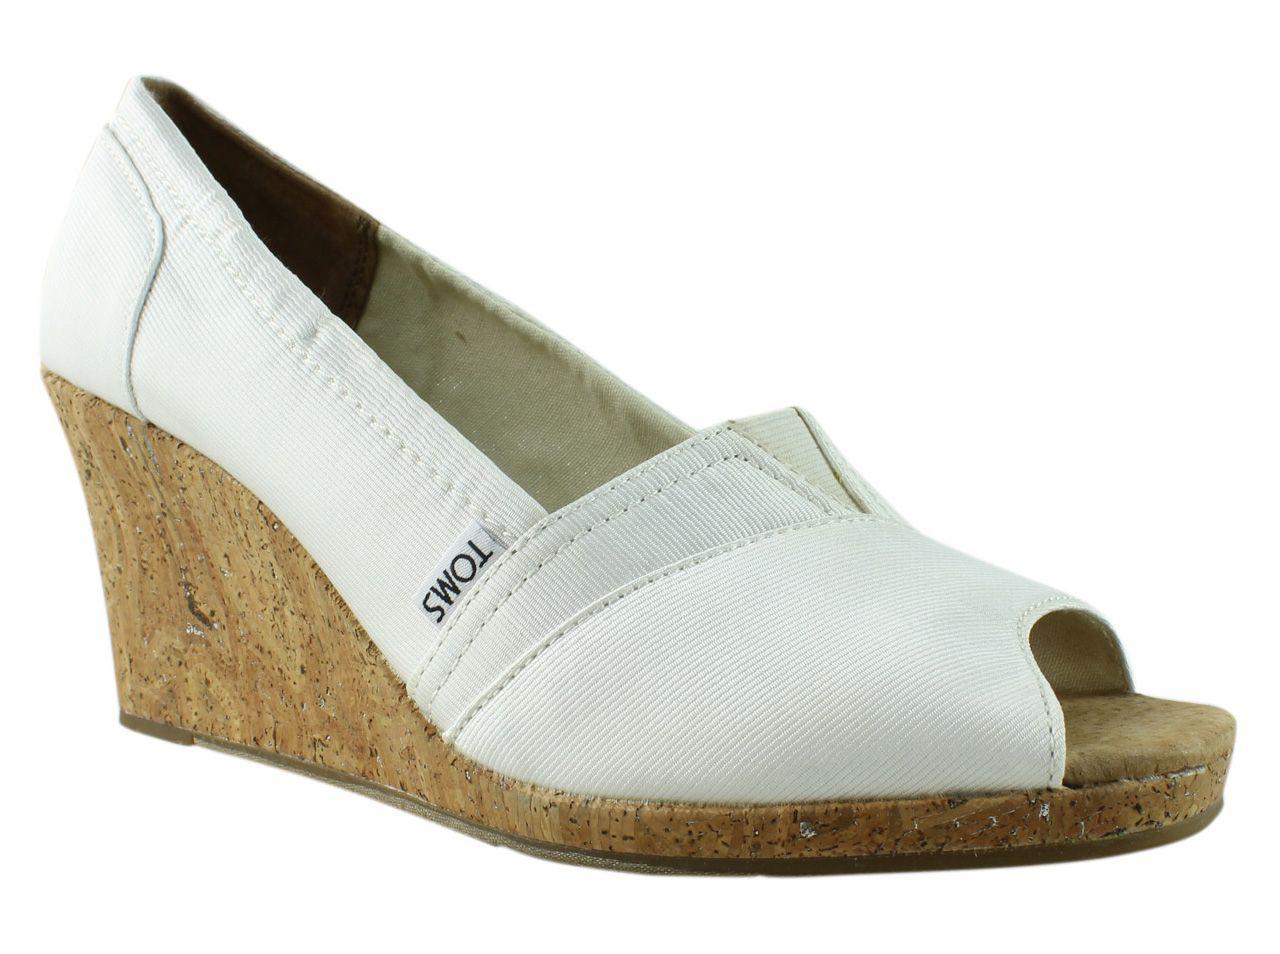 0db8cf6f69e TOMS - Multicolor Womens 010017b12-100 White Peep Toe Sandals - Lyst. View  fullscreen